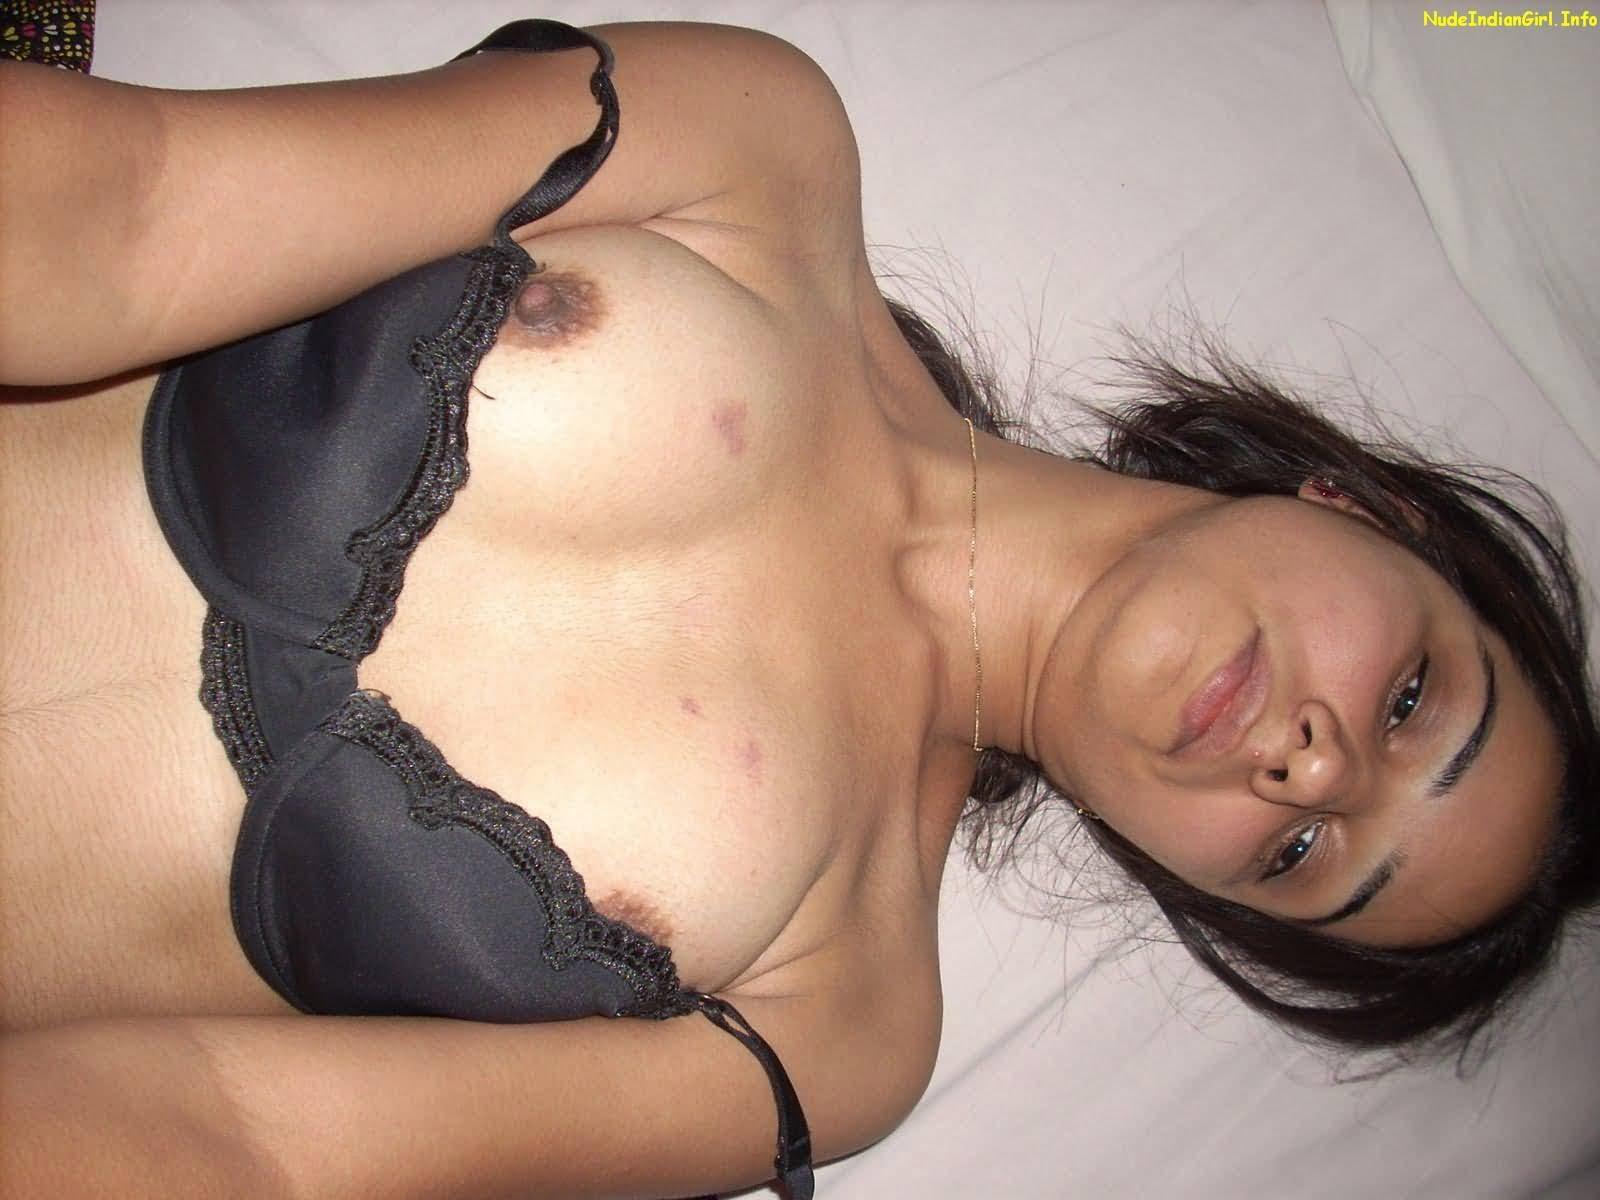 South Indian Tamil bhabhi nude boobs desi masala